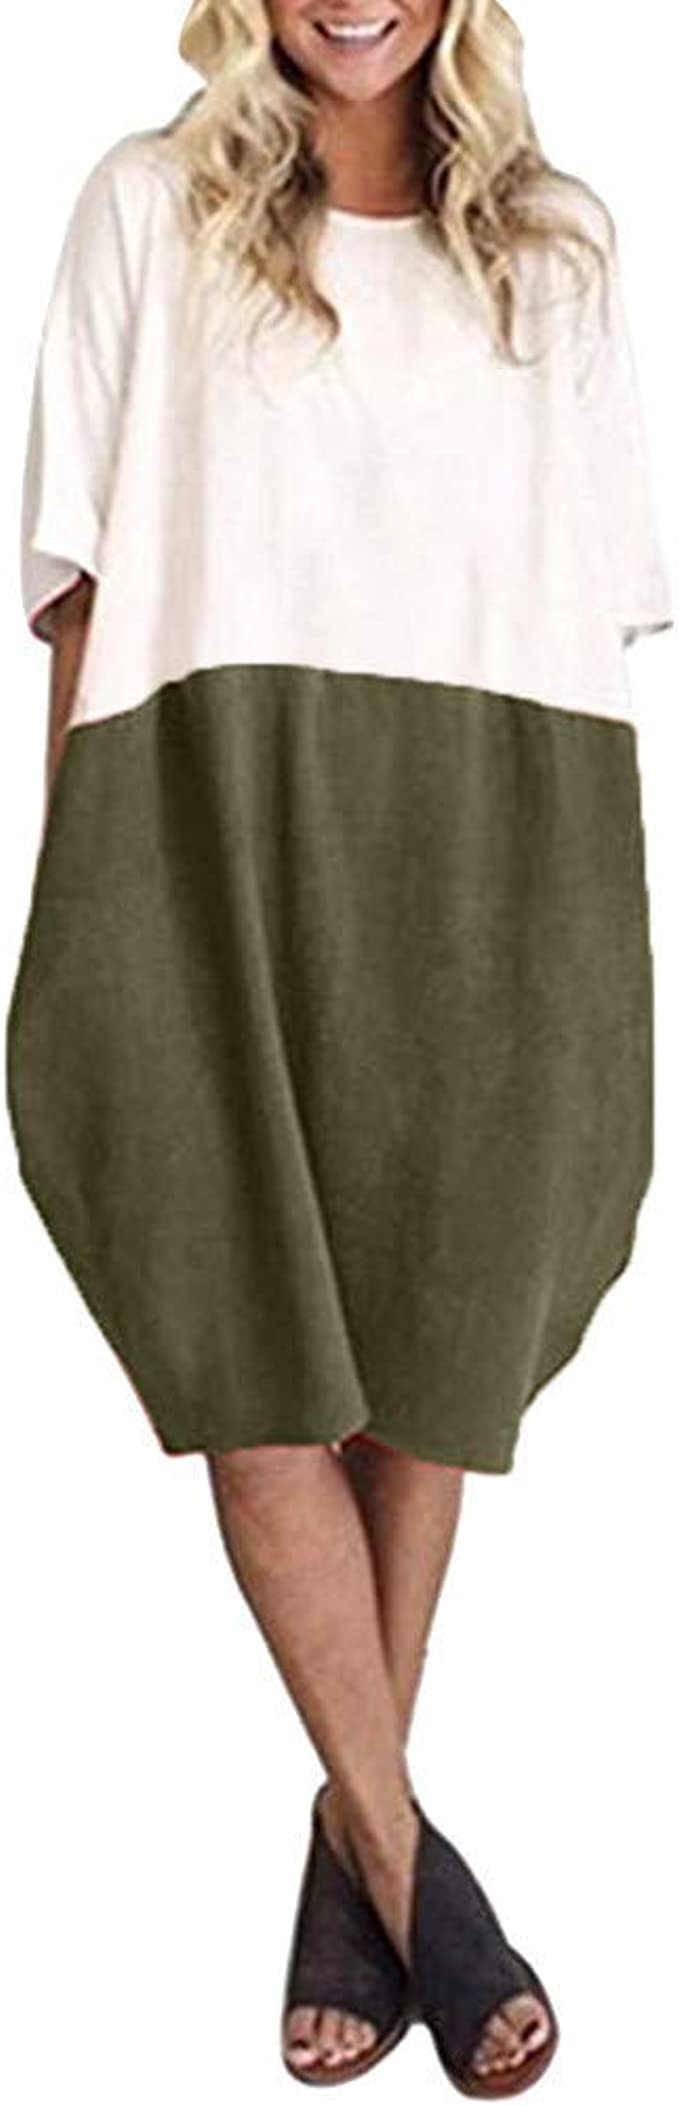 S-5XL Damen Kurzarm O Neck Kleid Hemdkleid Baumwolle Linen Freizeit Lose Rock